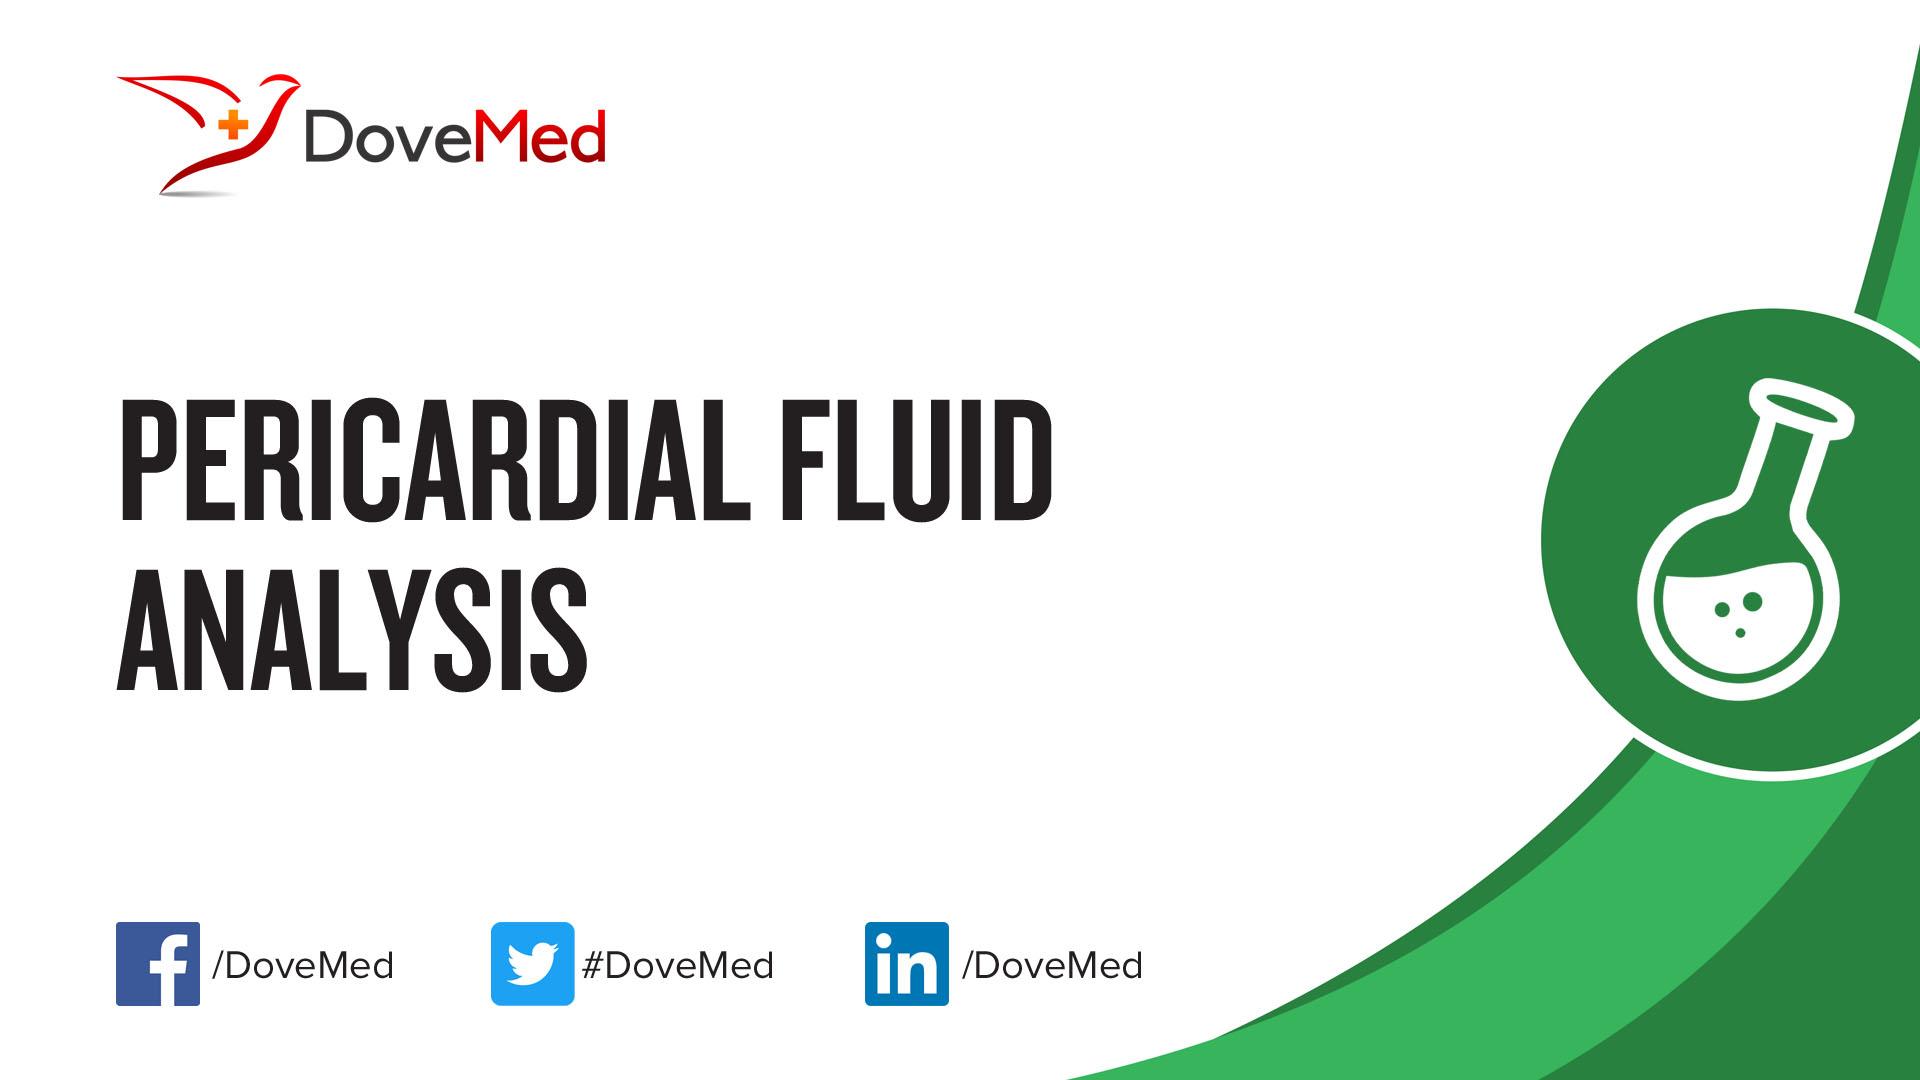 Pericardial Fluid Analysis